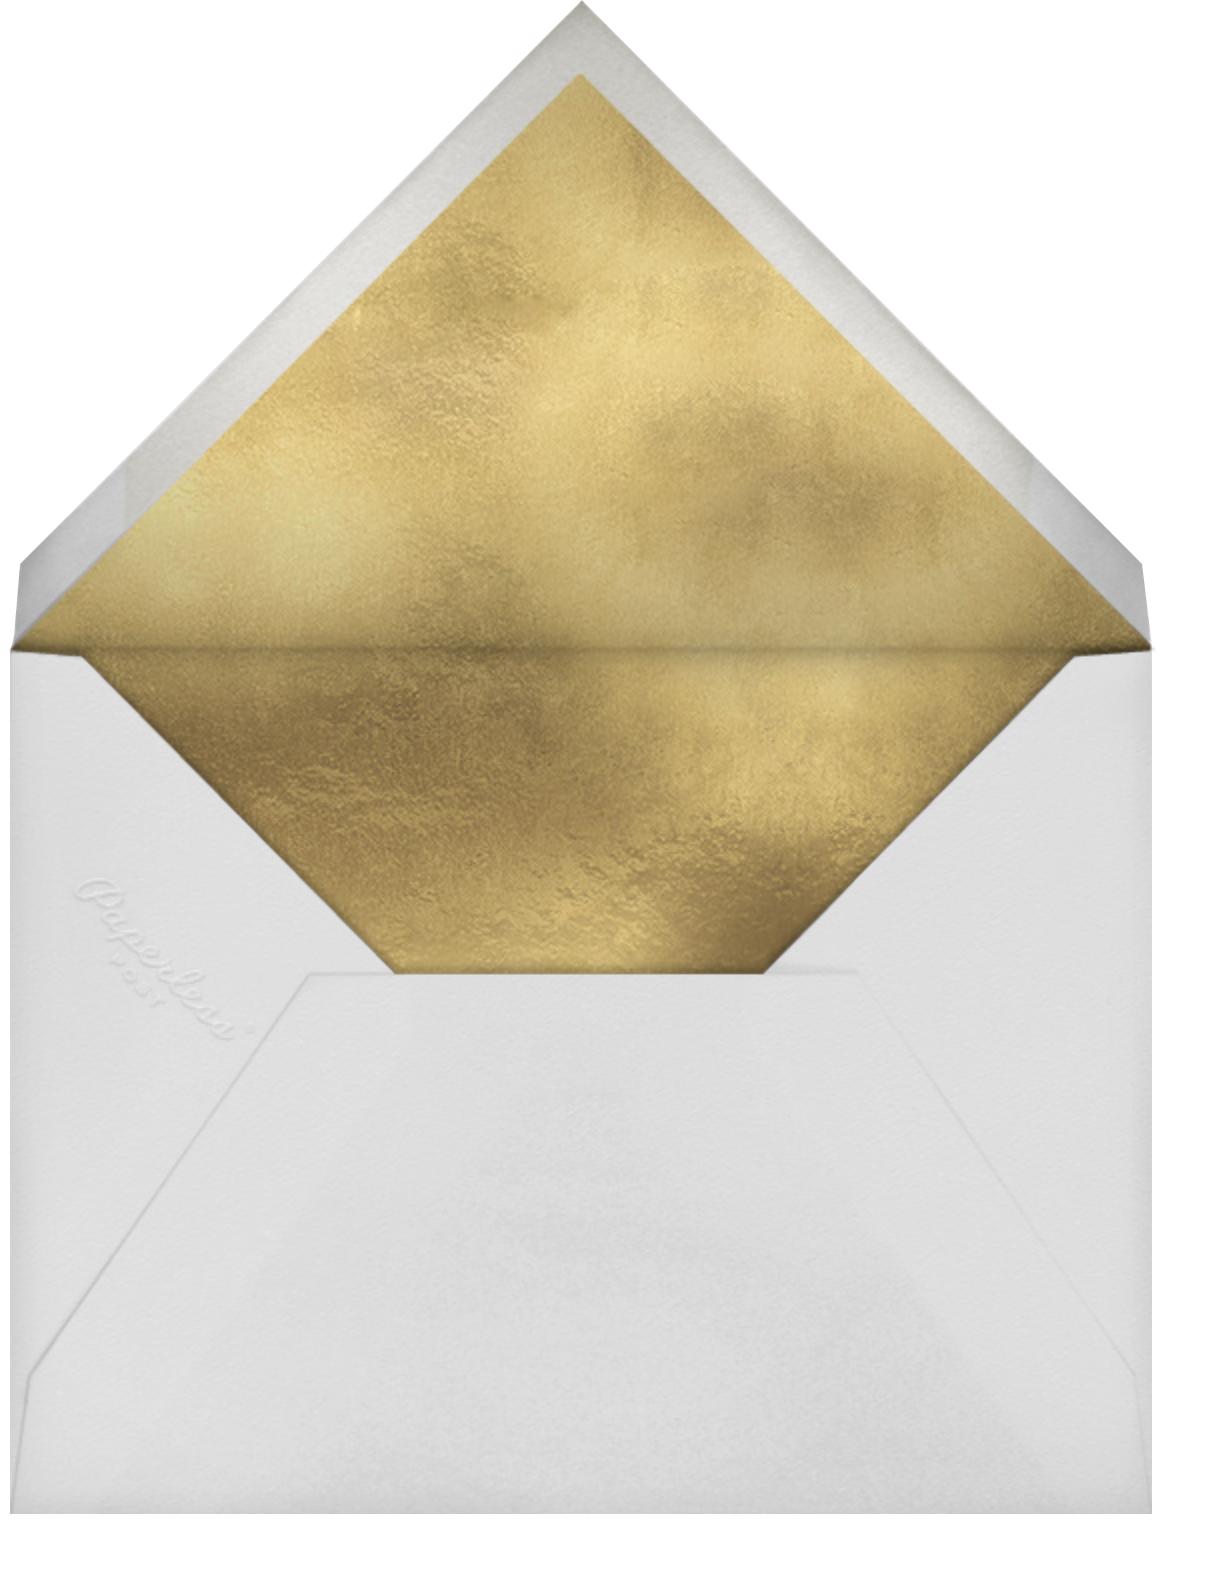 Heirloom Lace (Invitation) - White - Oscar de la Renta - Classic  - envelope back